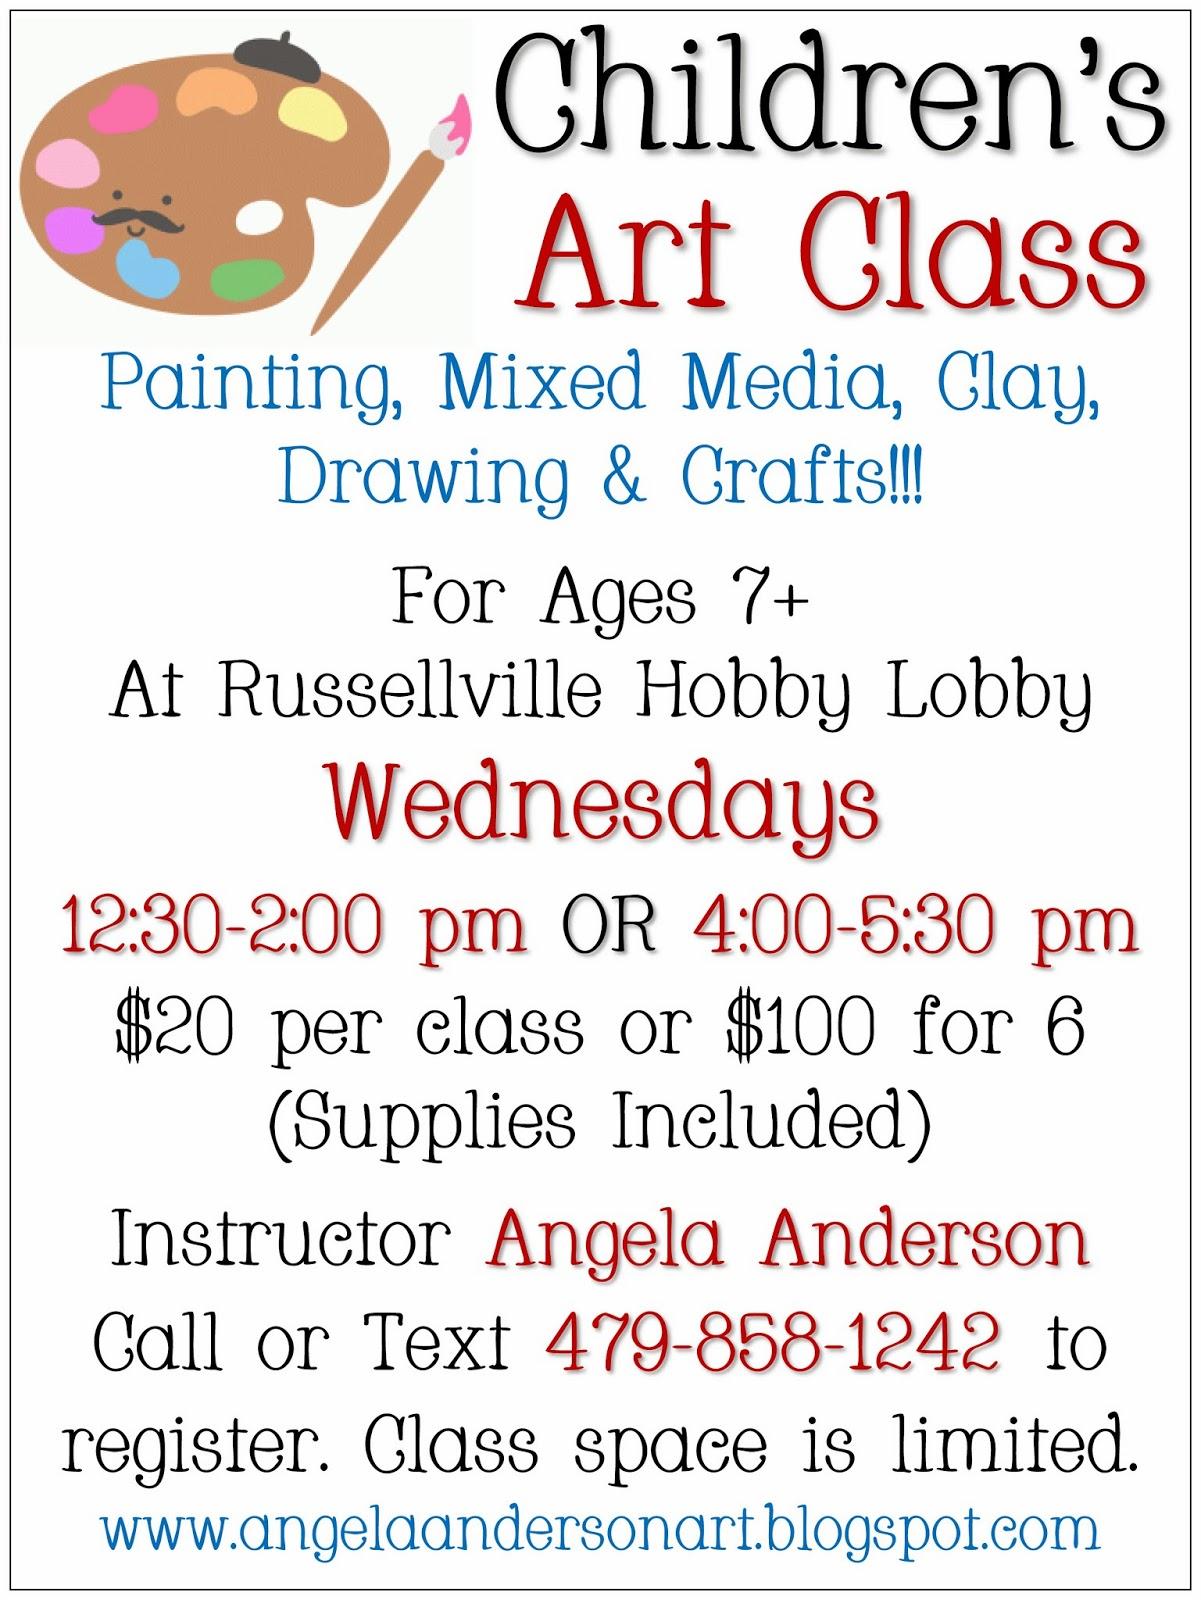 Angelas Art Class Registration